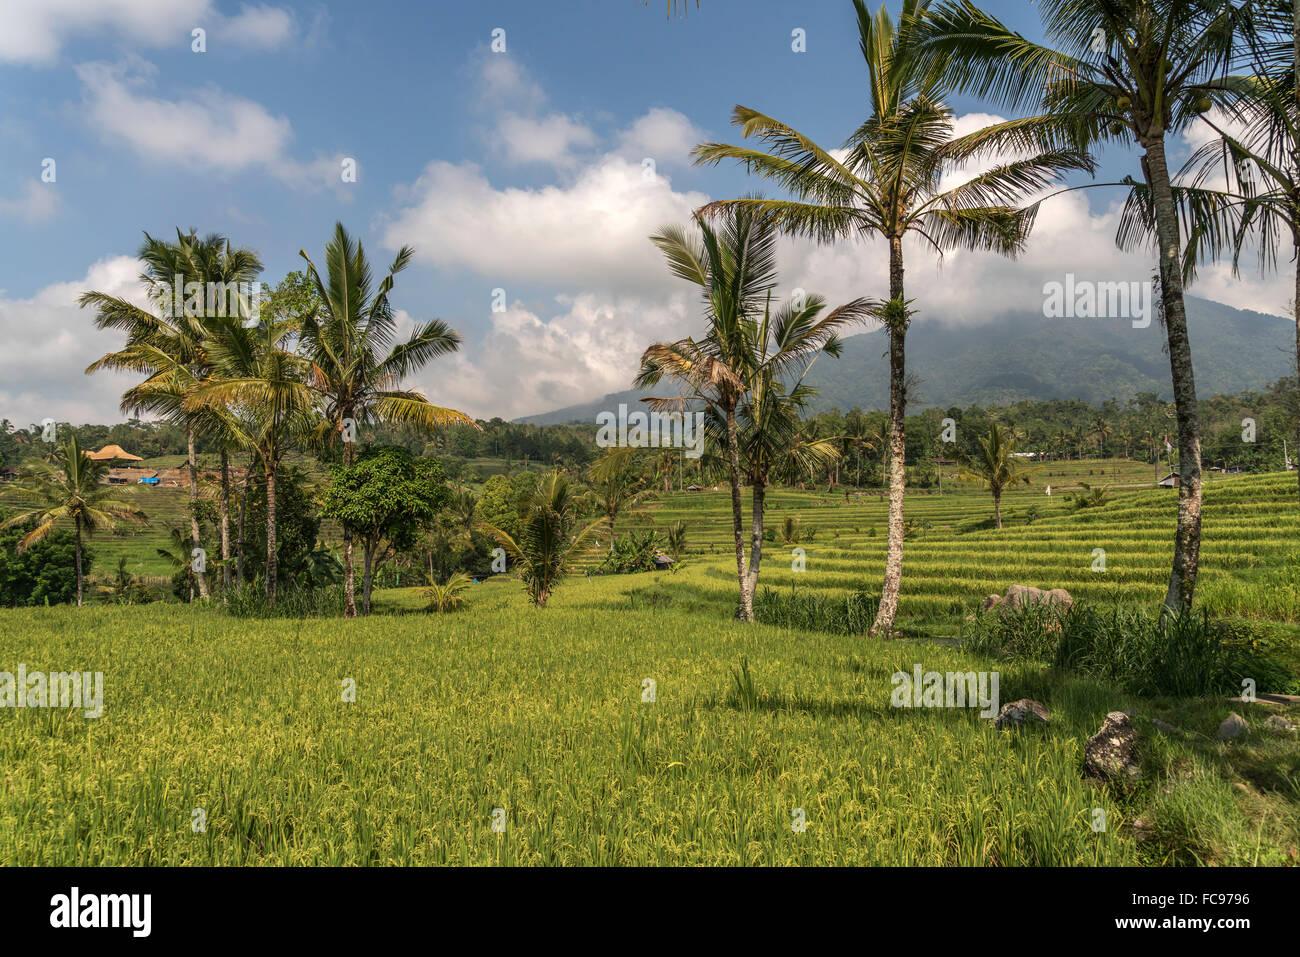 Reisterrassen Jatiluwih, UNESCO Welterbe von auf Bali, Indonesia | les rizières en terrasses de Jatiluwih, Photo Stock